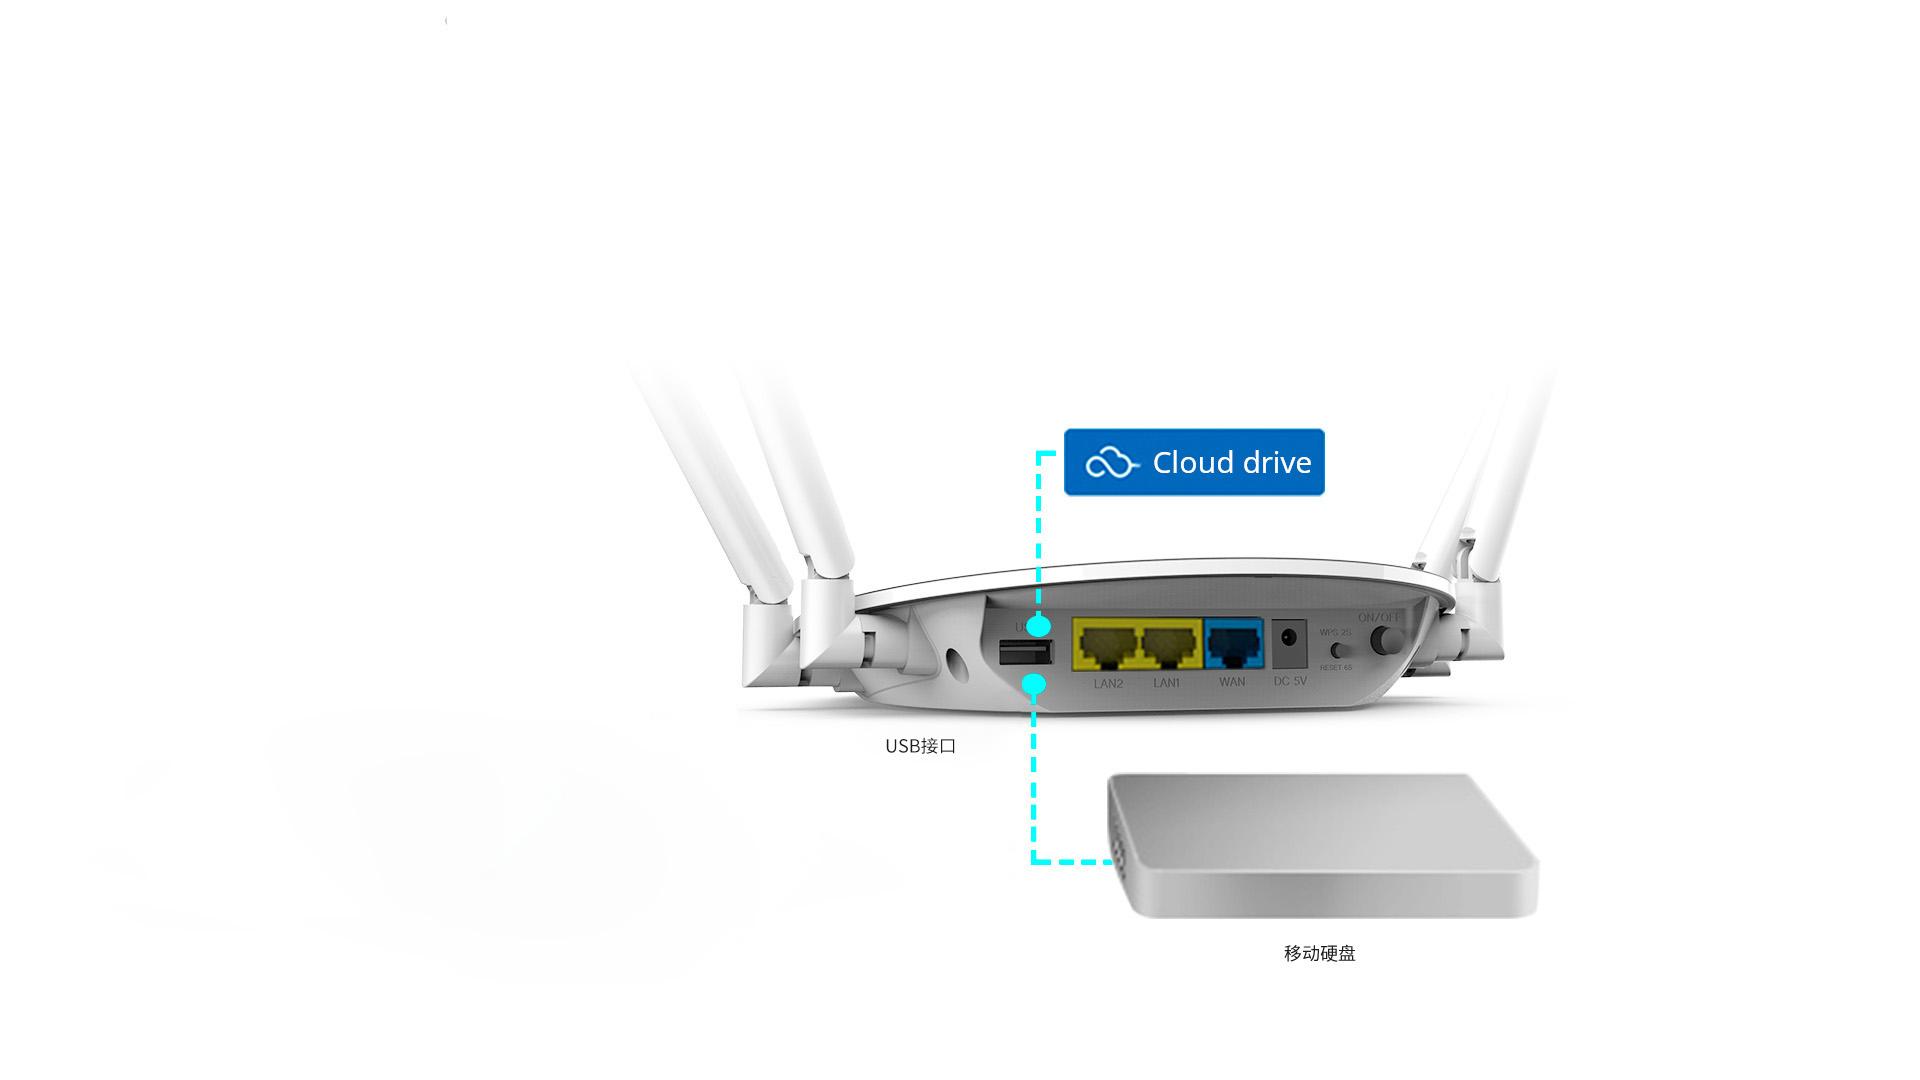 S32路由器,配备usb接口,轻松共享文件